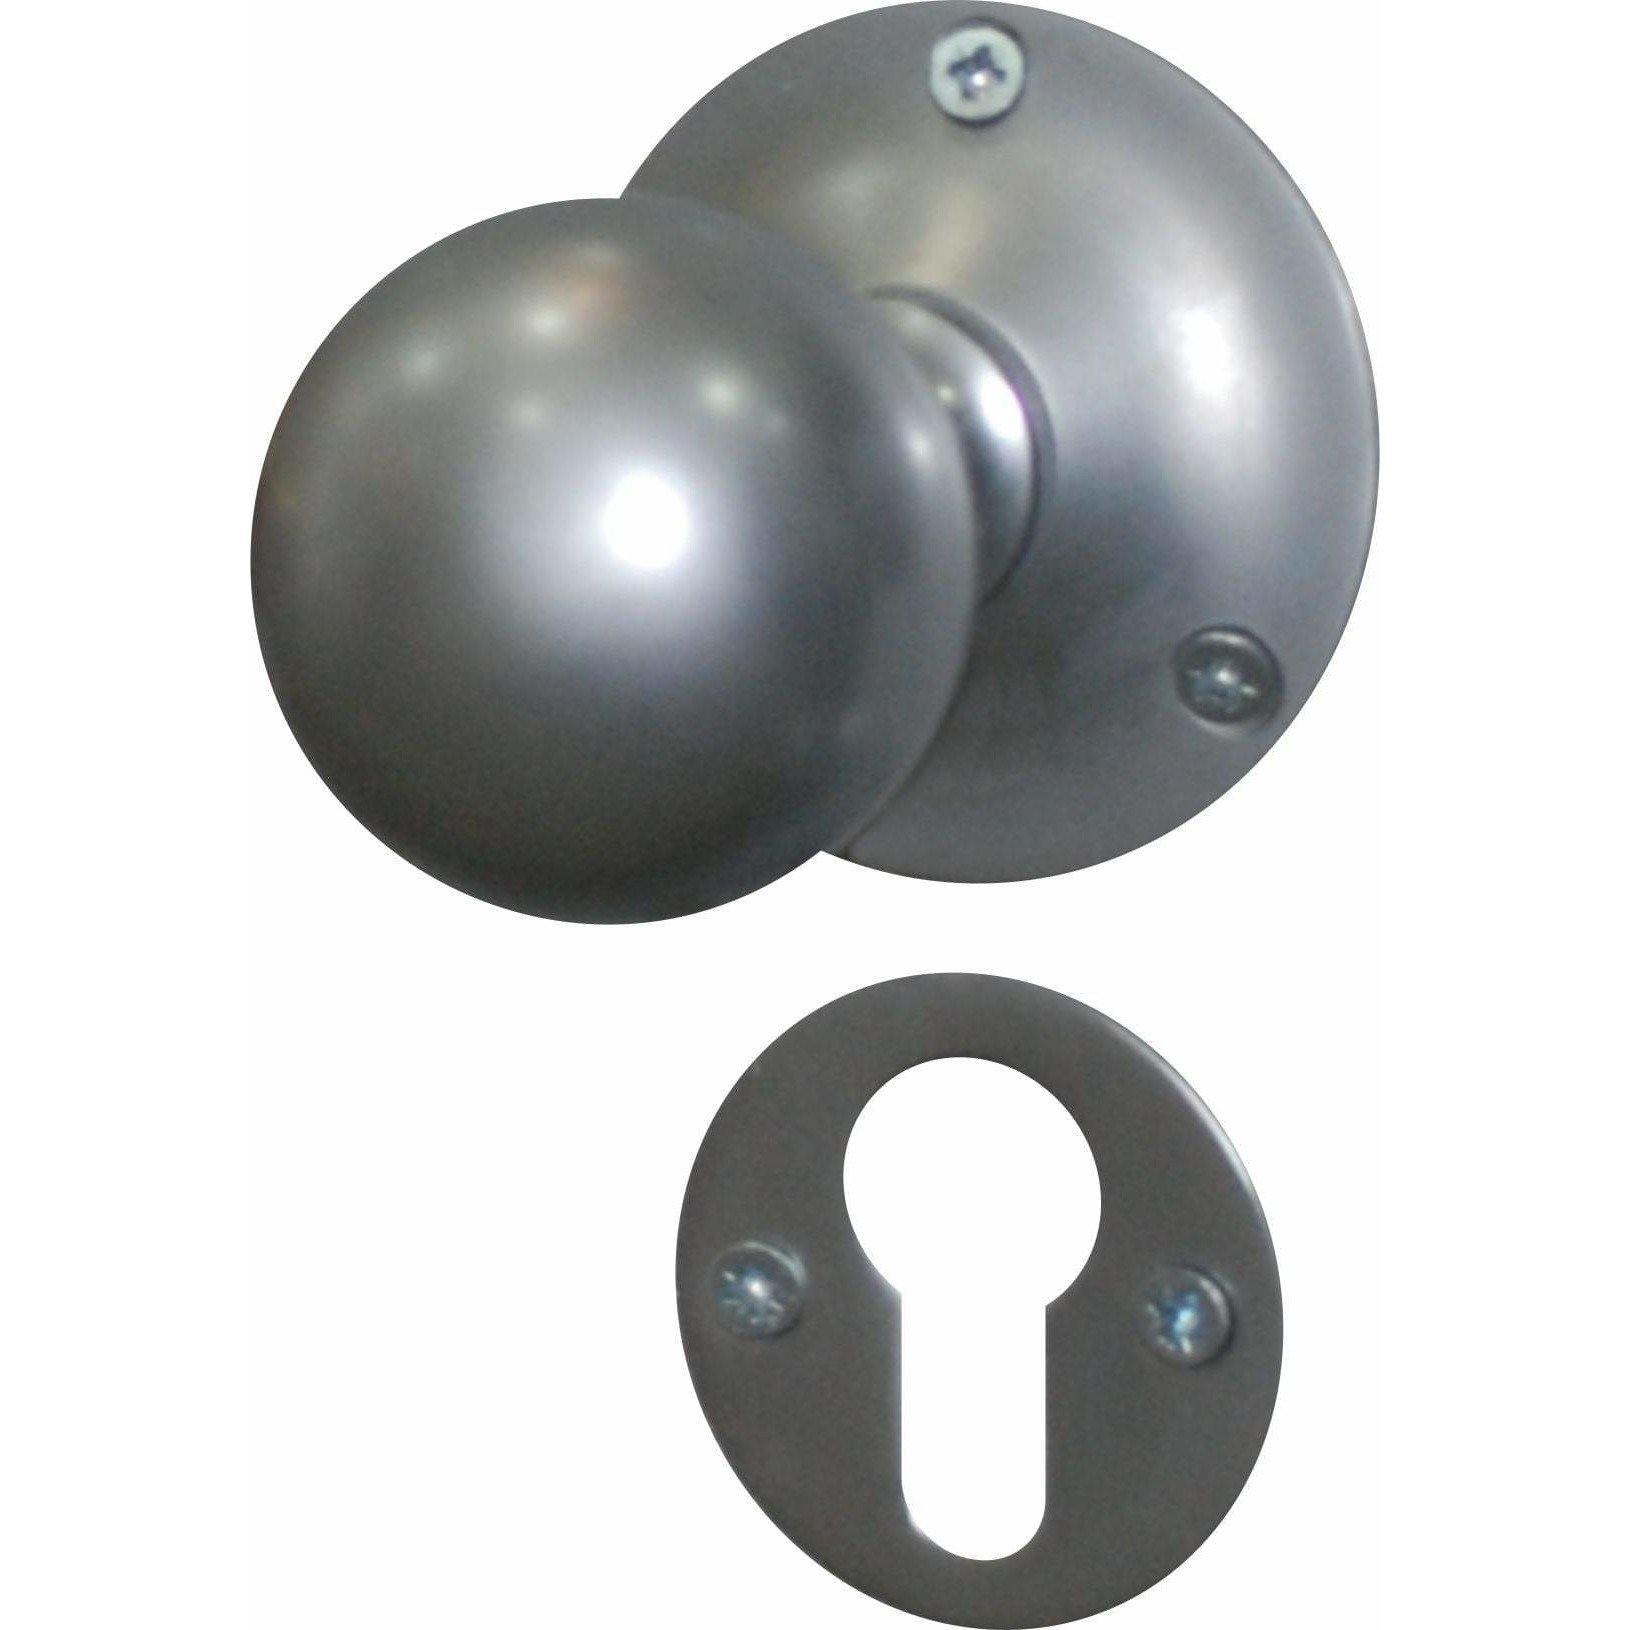 Ball type solid brass knob